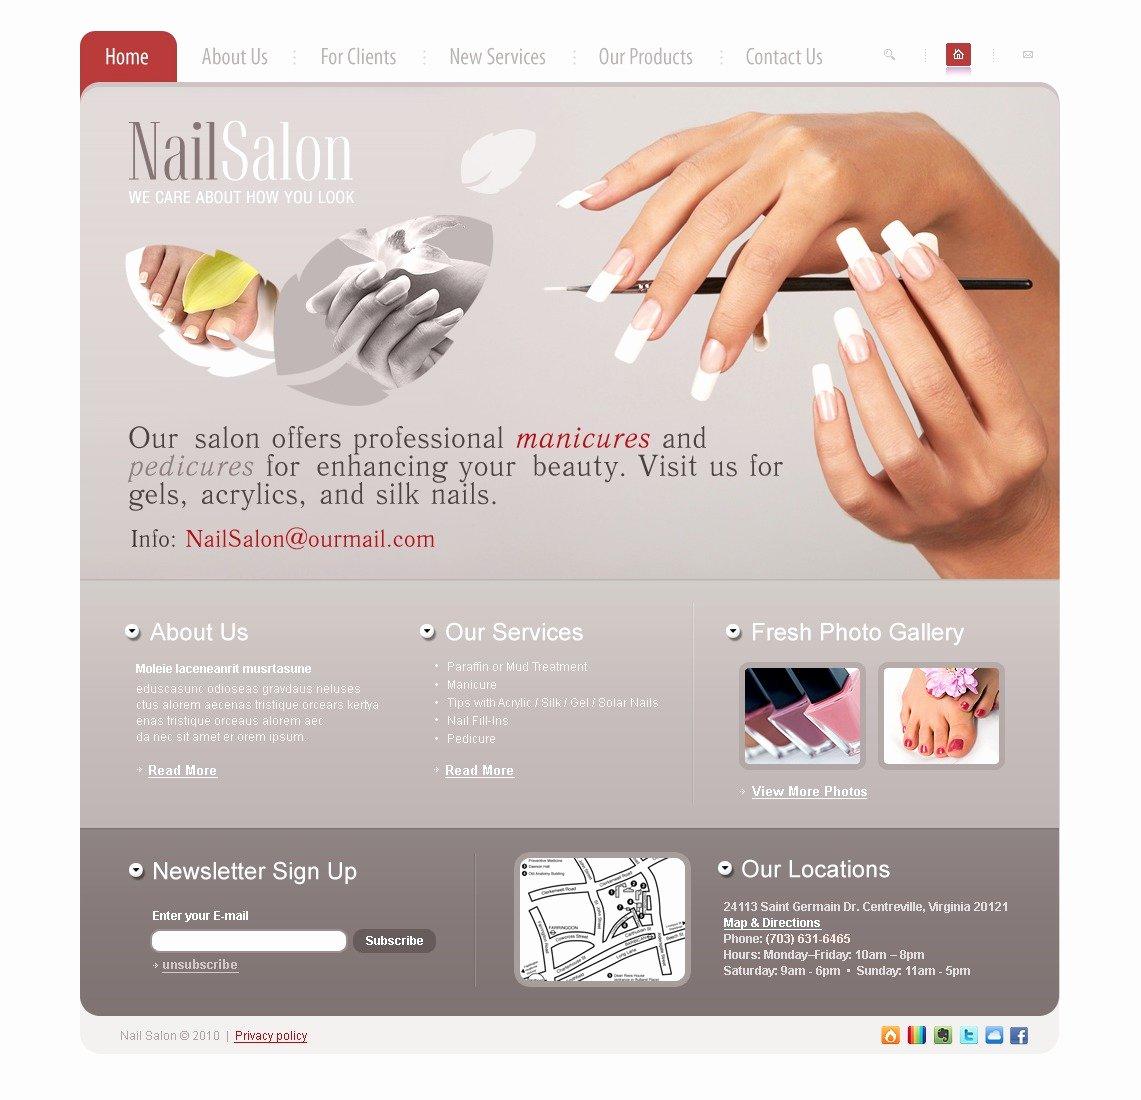 Nail Salon Price List Template Inspirational Nail Salon Website Template